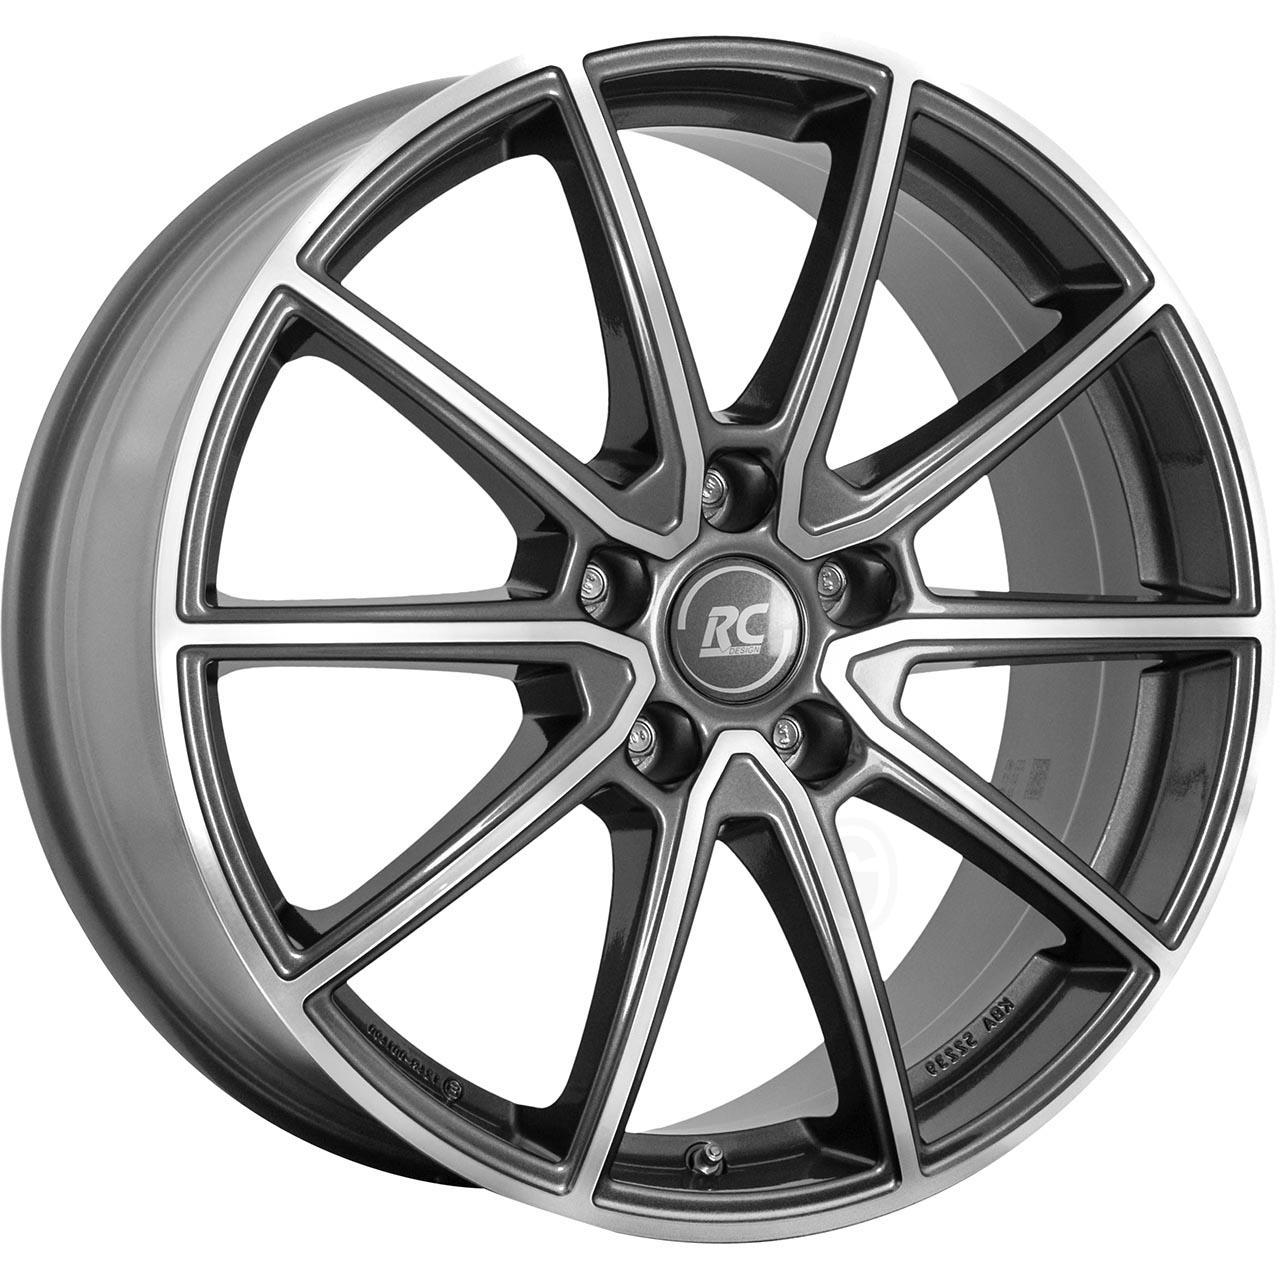 RC Design Rc32 Himalaya grey voll poliert hgvp 8x19 5x112 ET38